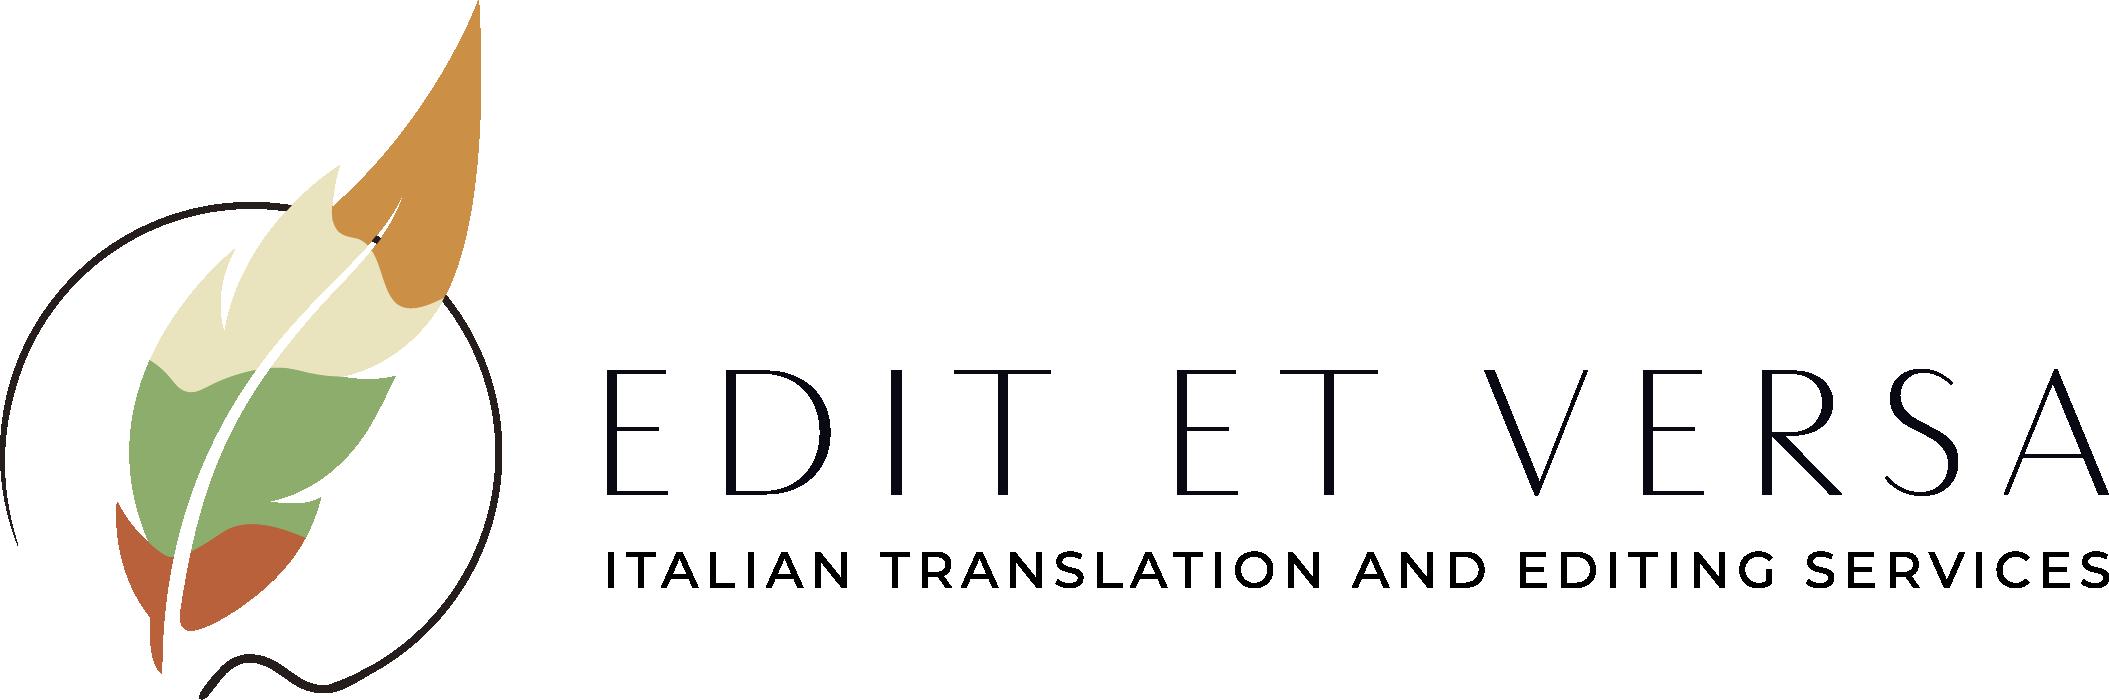 Logo_EditetVersa_italian translations for marketing